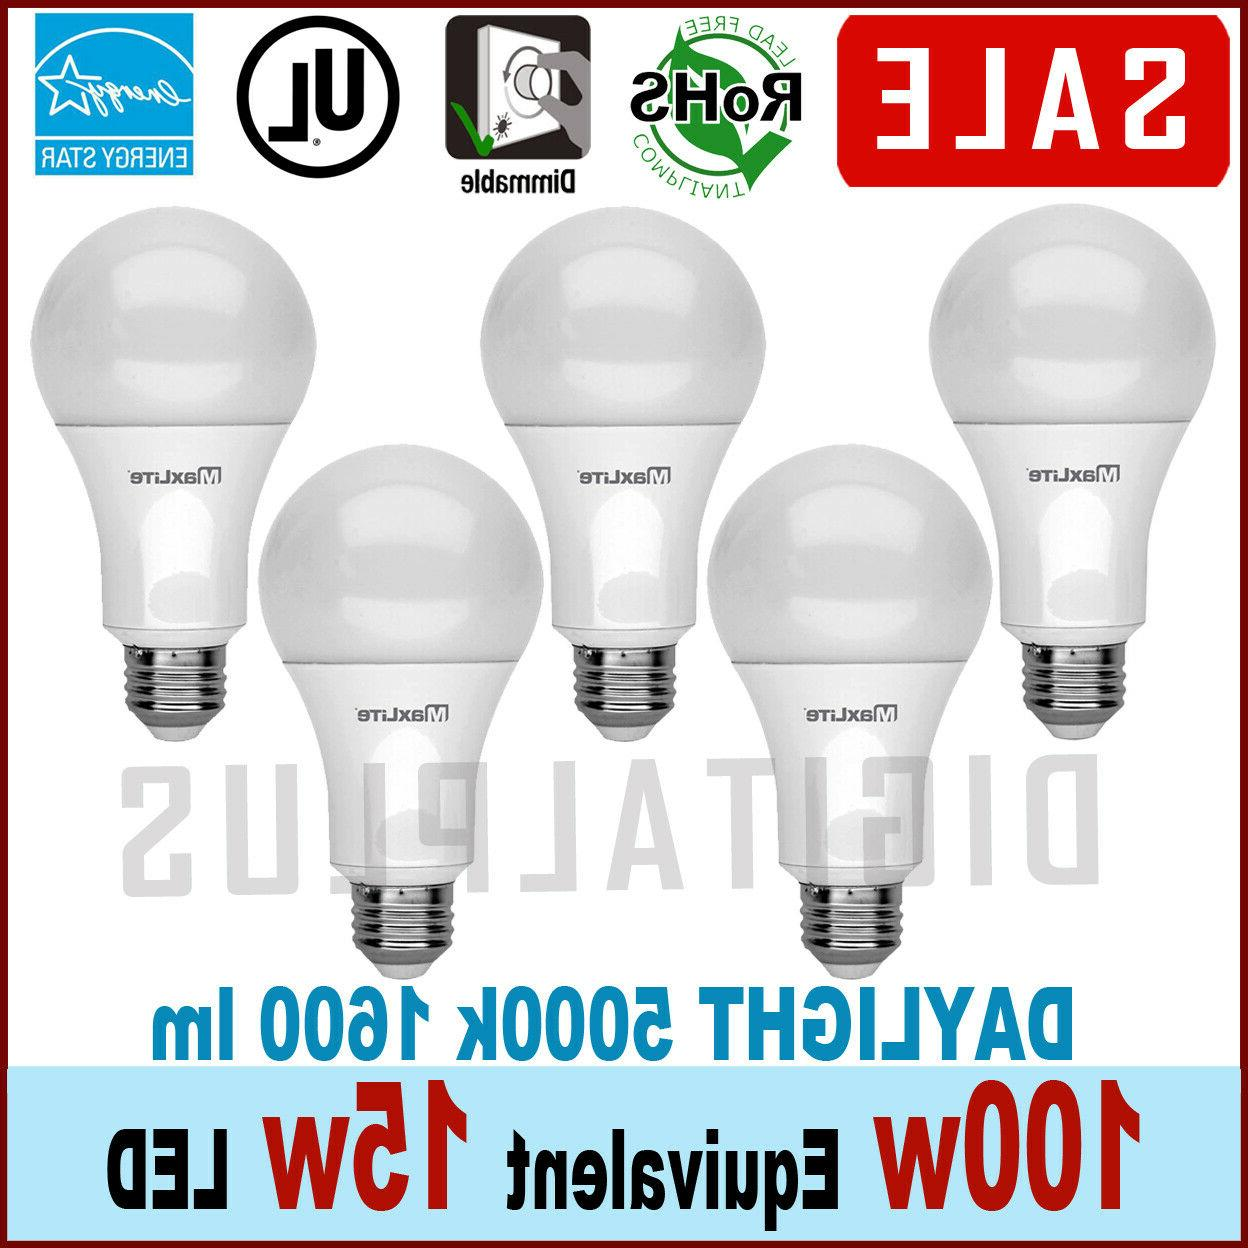 qty 5 led daylight dimmable light bulb